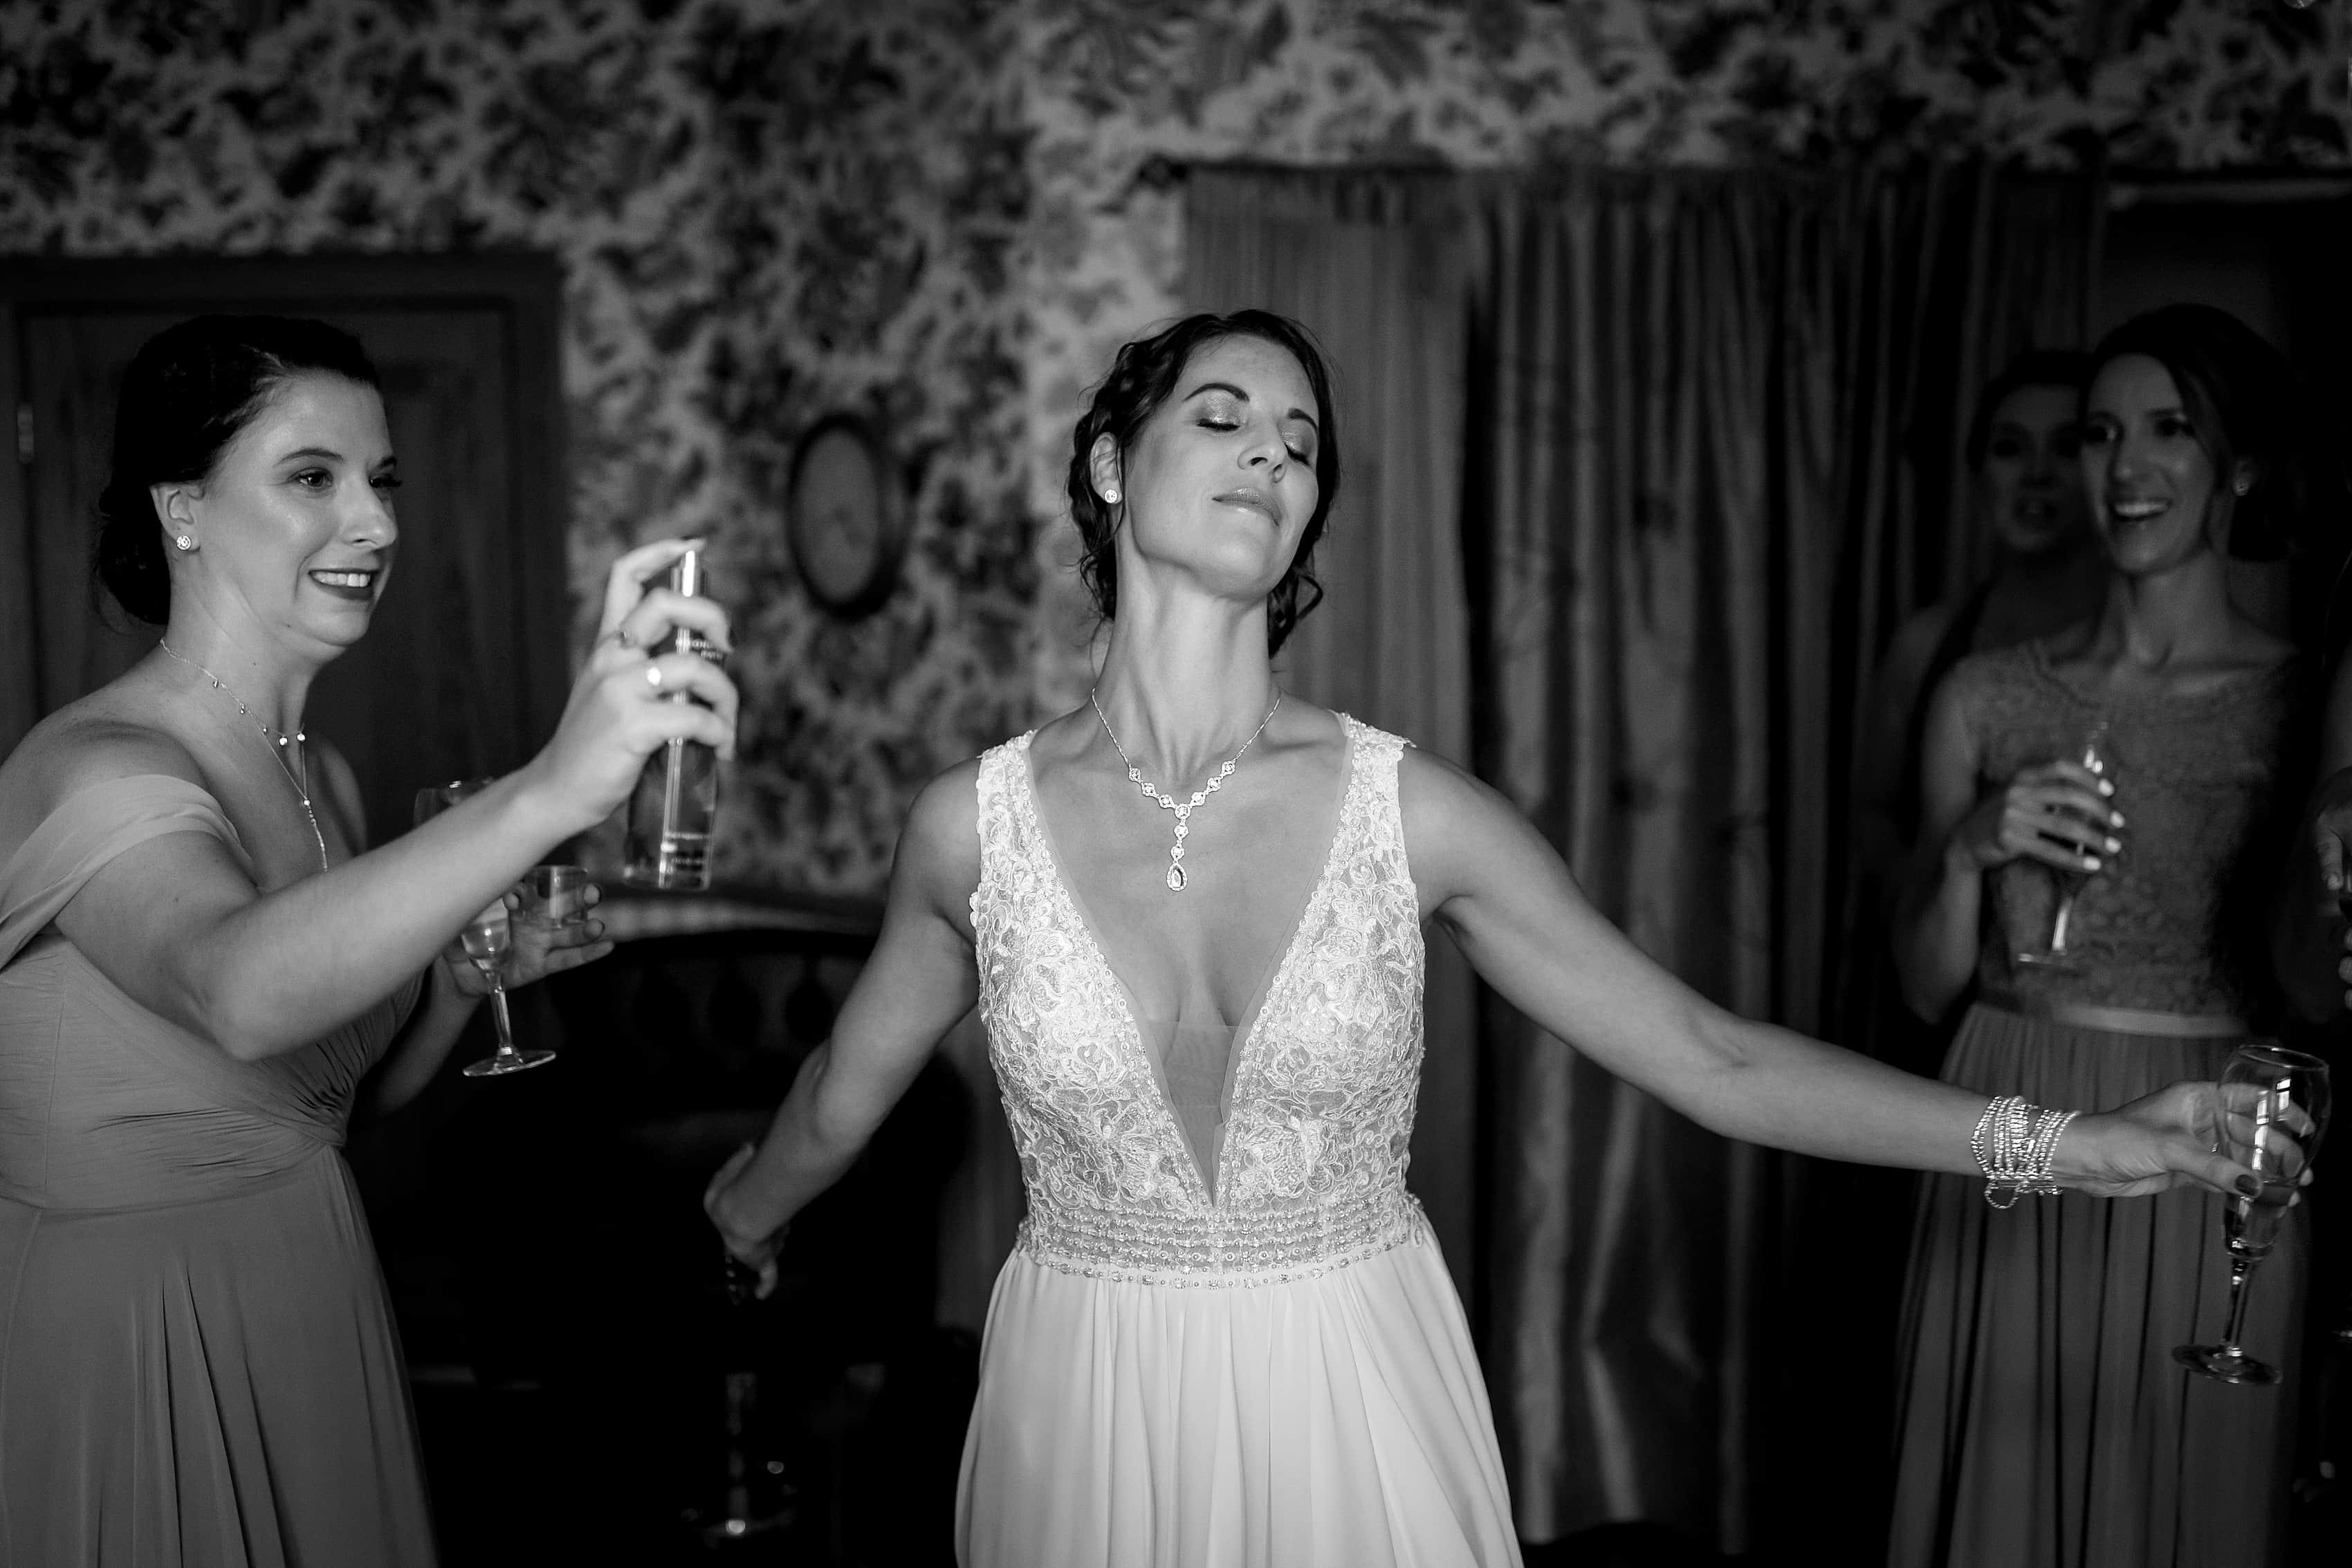 bride walks through perfume spray